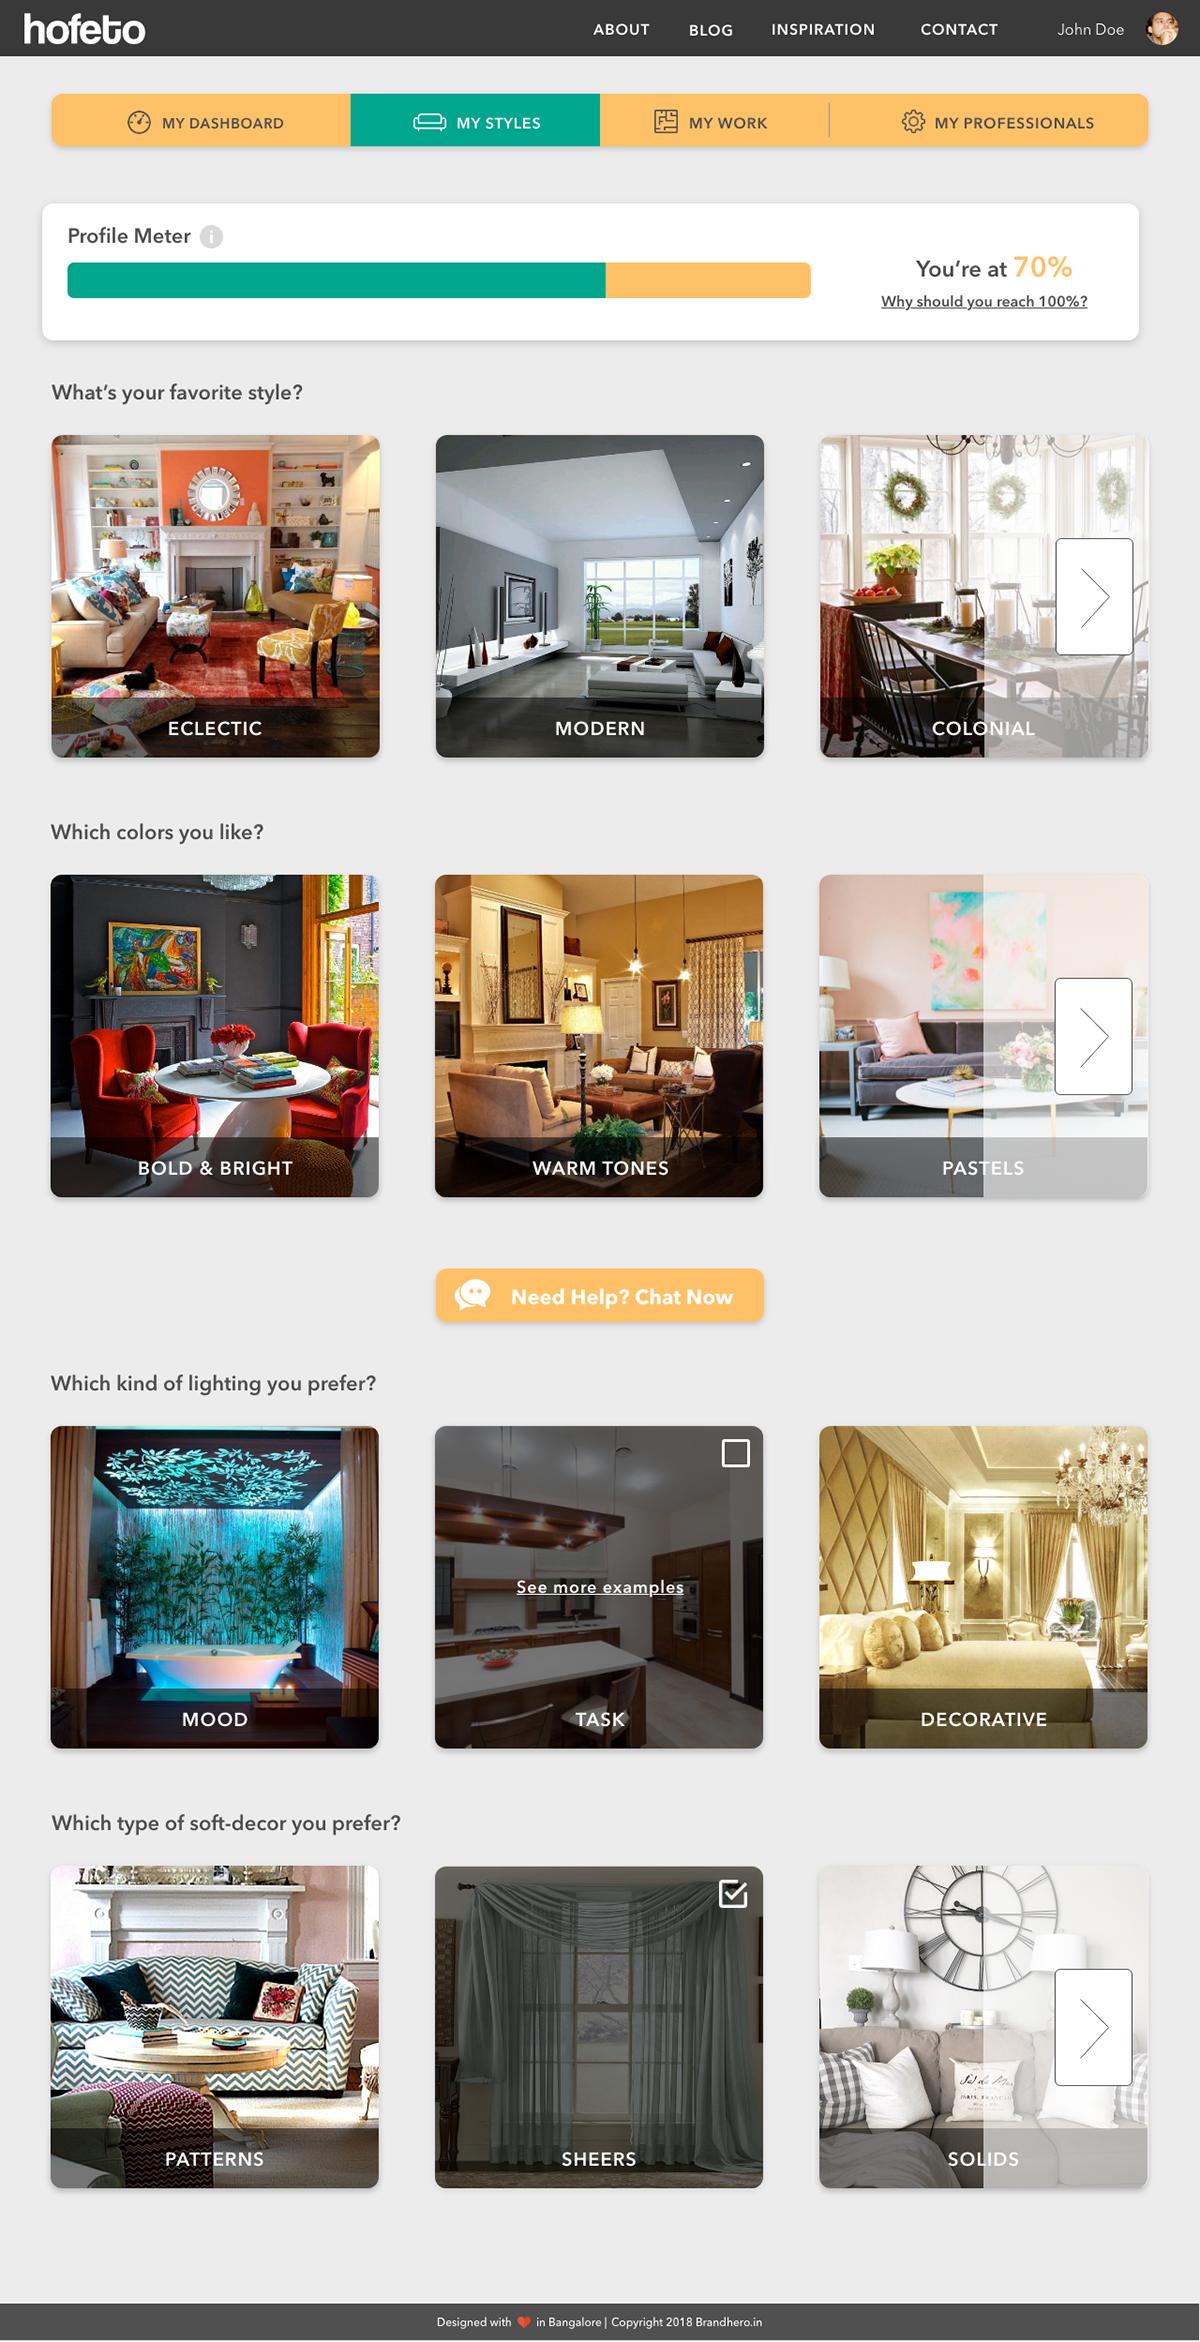 uiux UI ux design experiencedesign Webdesign Web dashboard moderndesign uxdesign